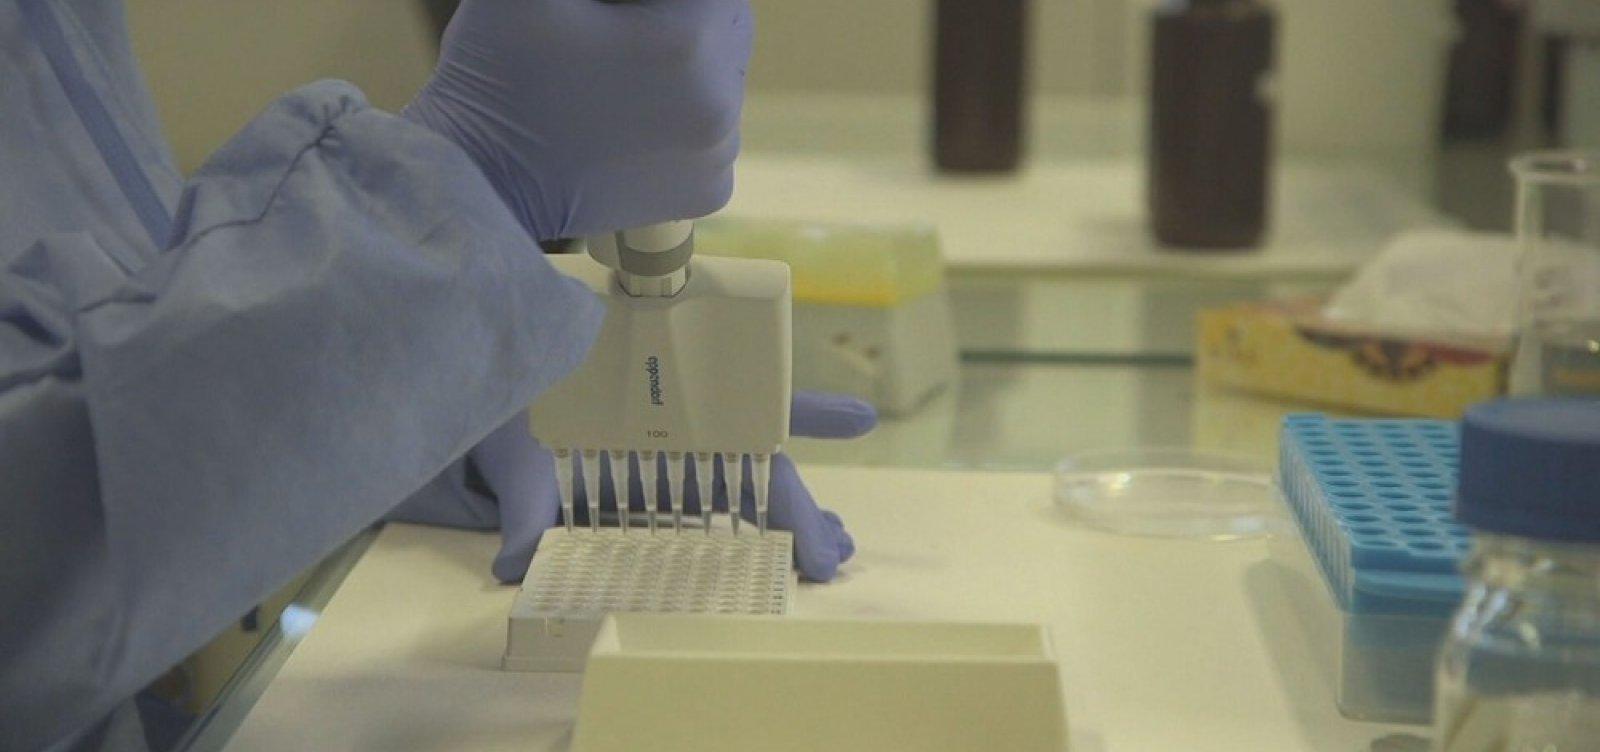 [Coronavírus: número de mortes no Brasil sobe para 240]